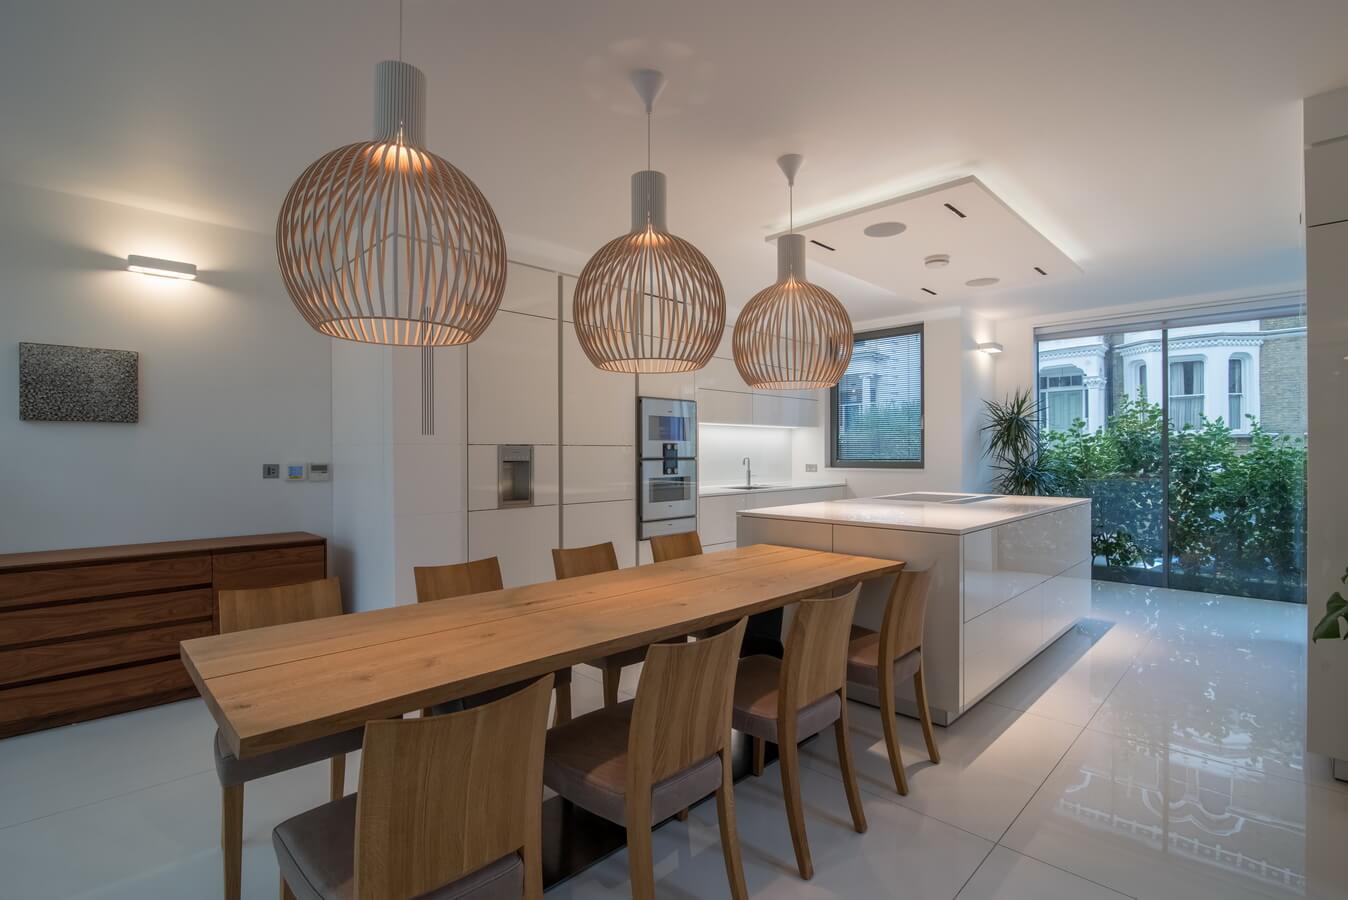 Warendorf-Kitchen-North-London-Belsize-Park.jpg